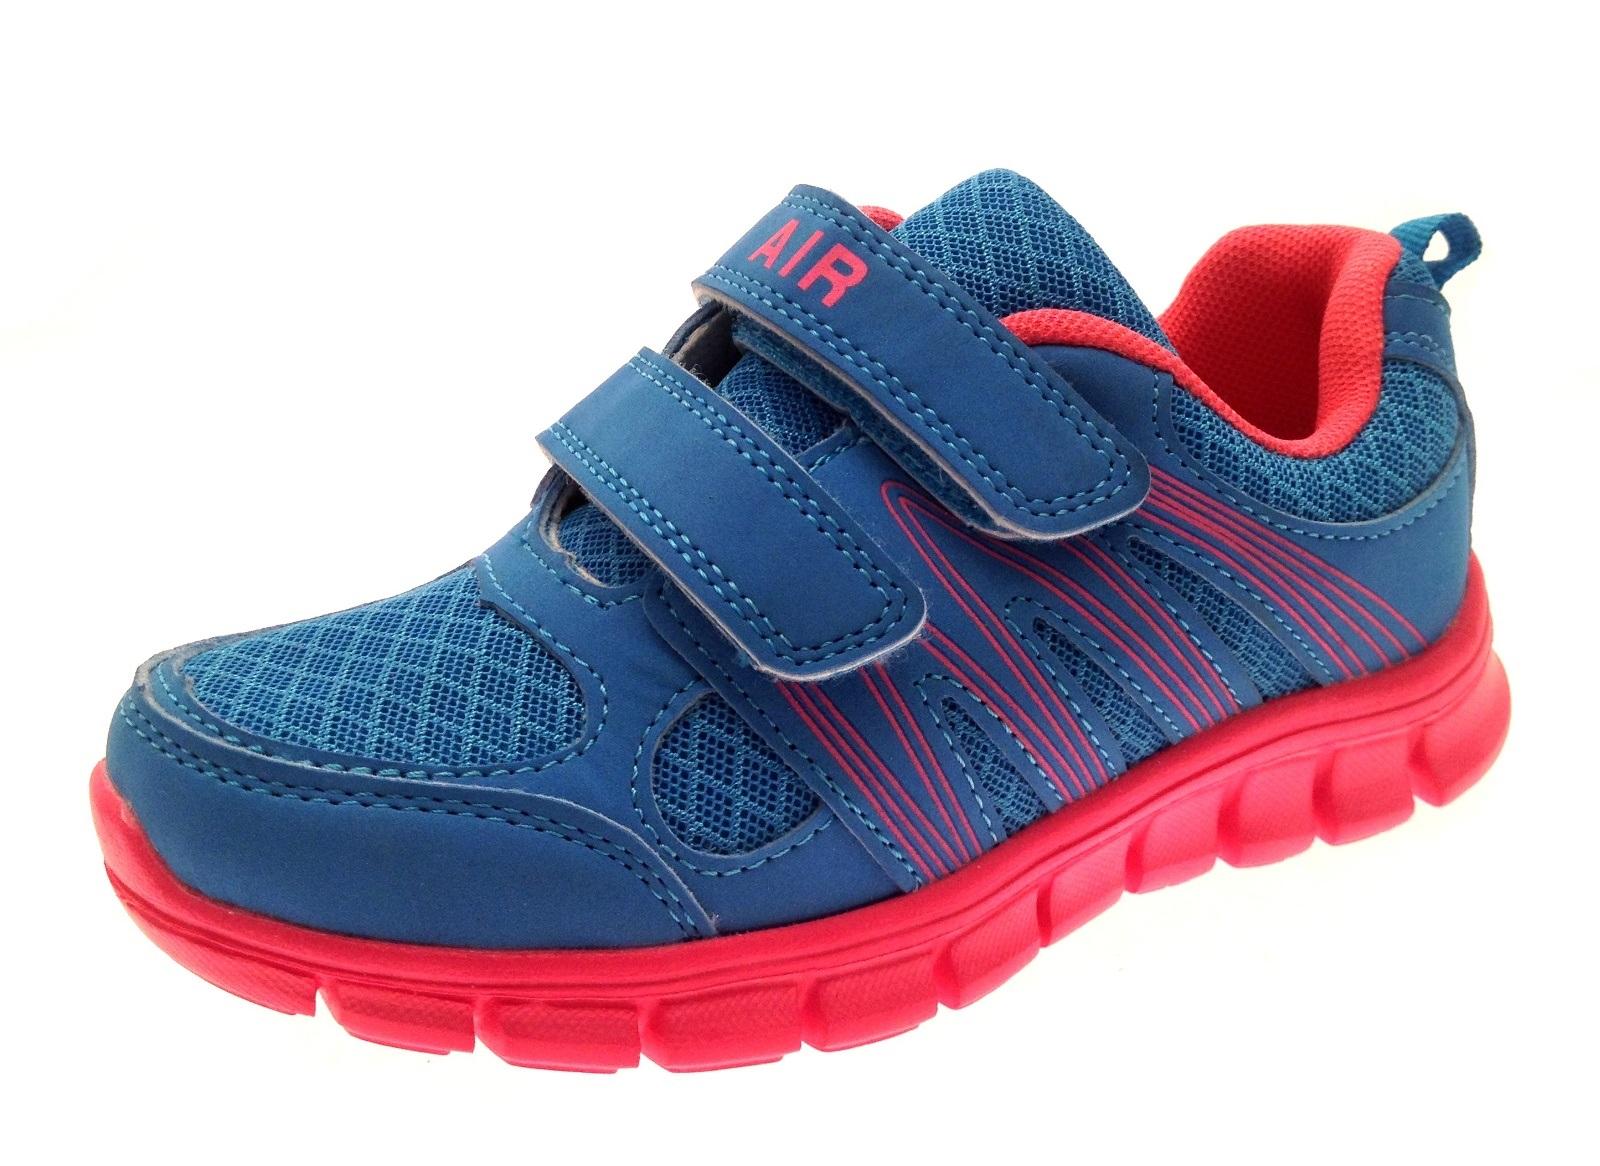 Ebay Childrens Shoes Uk